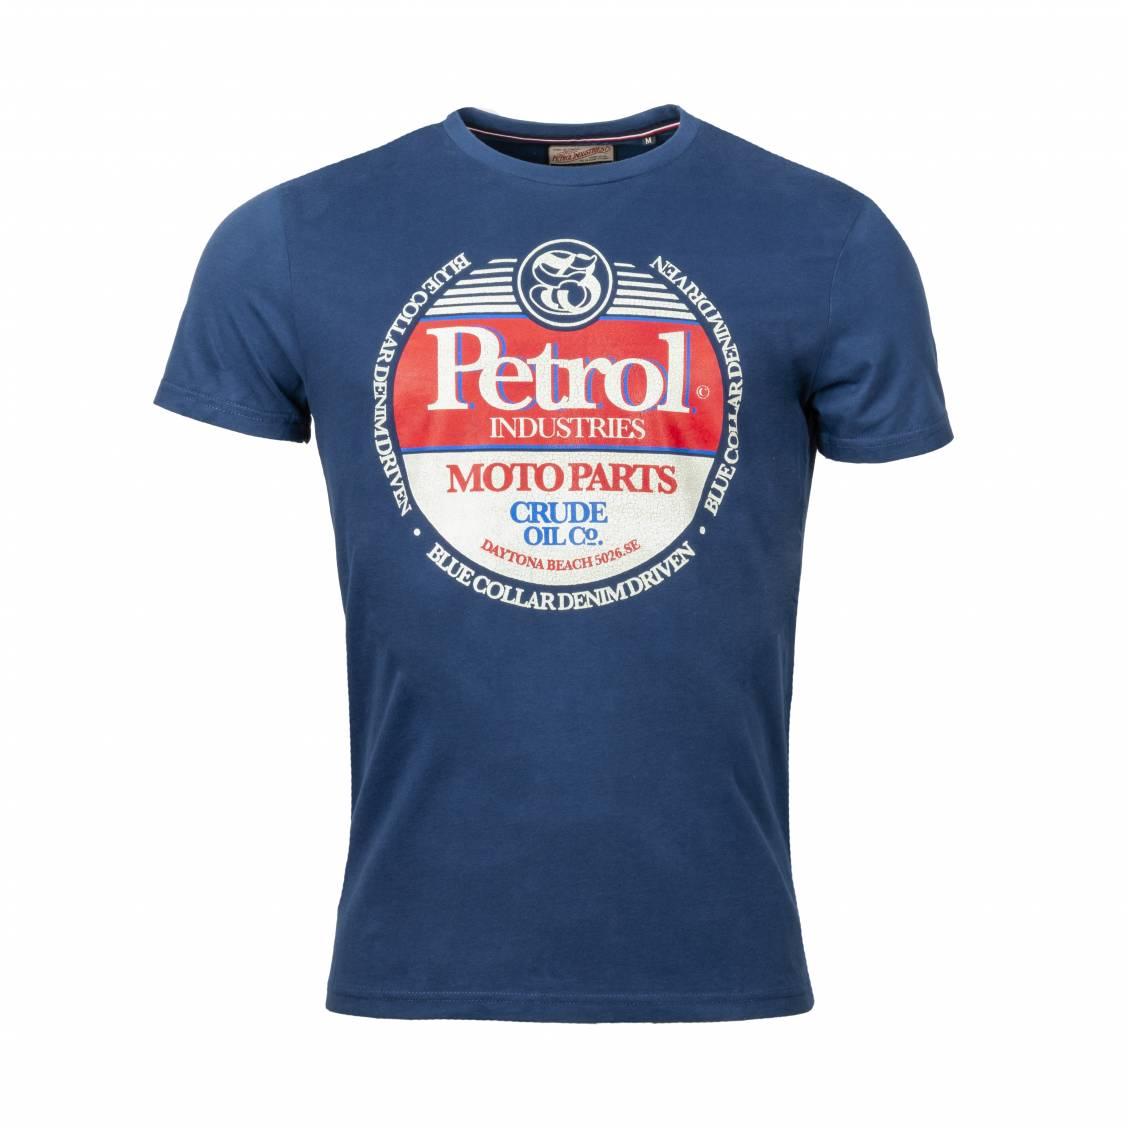 Tee-shirt col rond Petrol Industries en coton bleu marine floqué